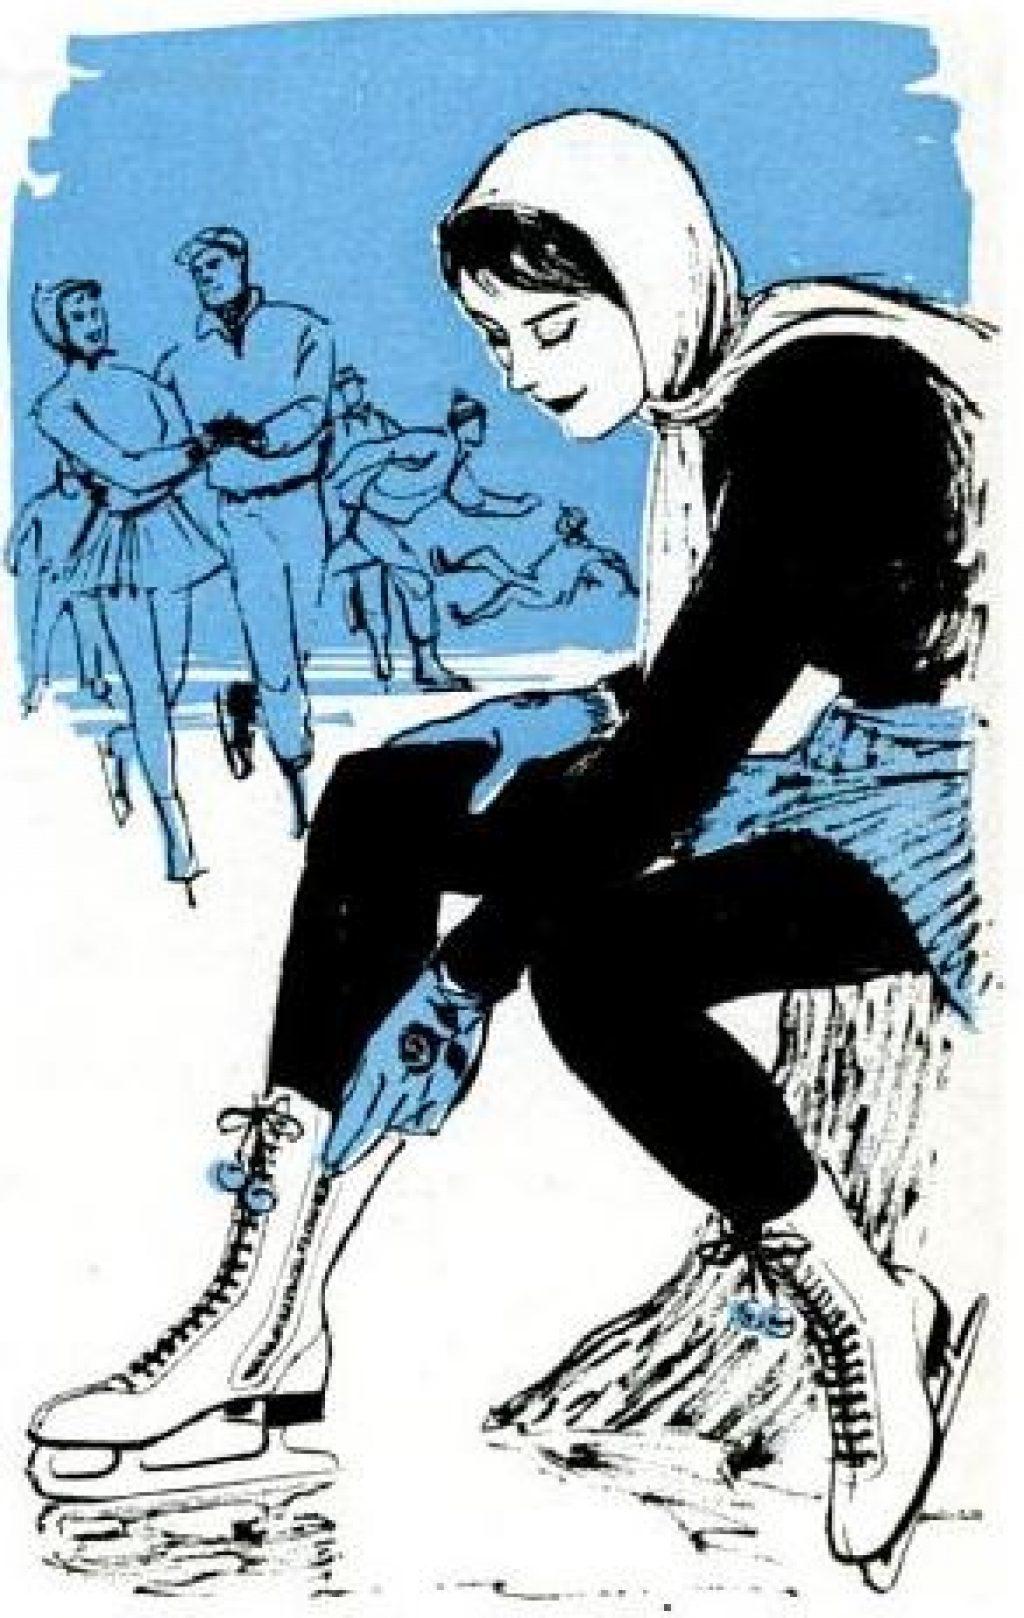 zip up ice skates